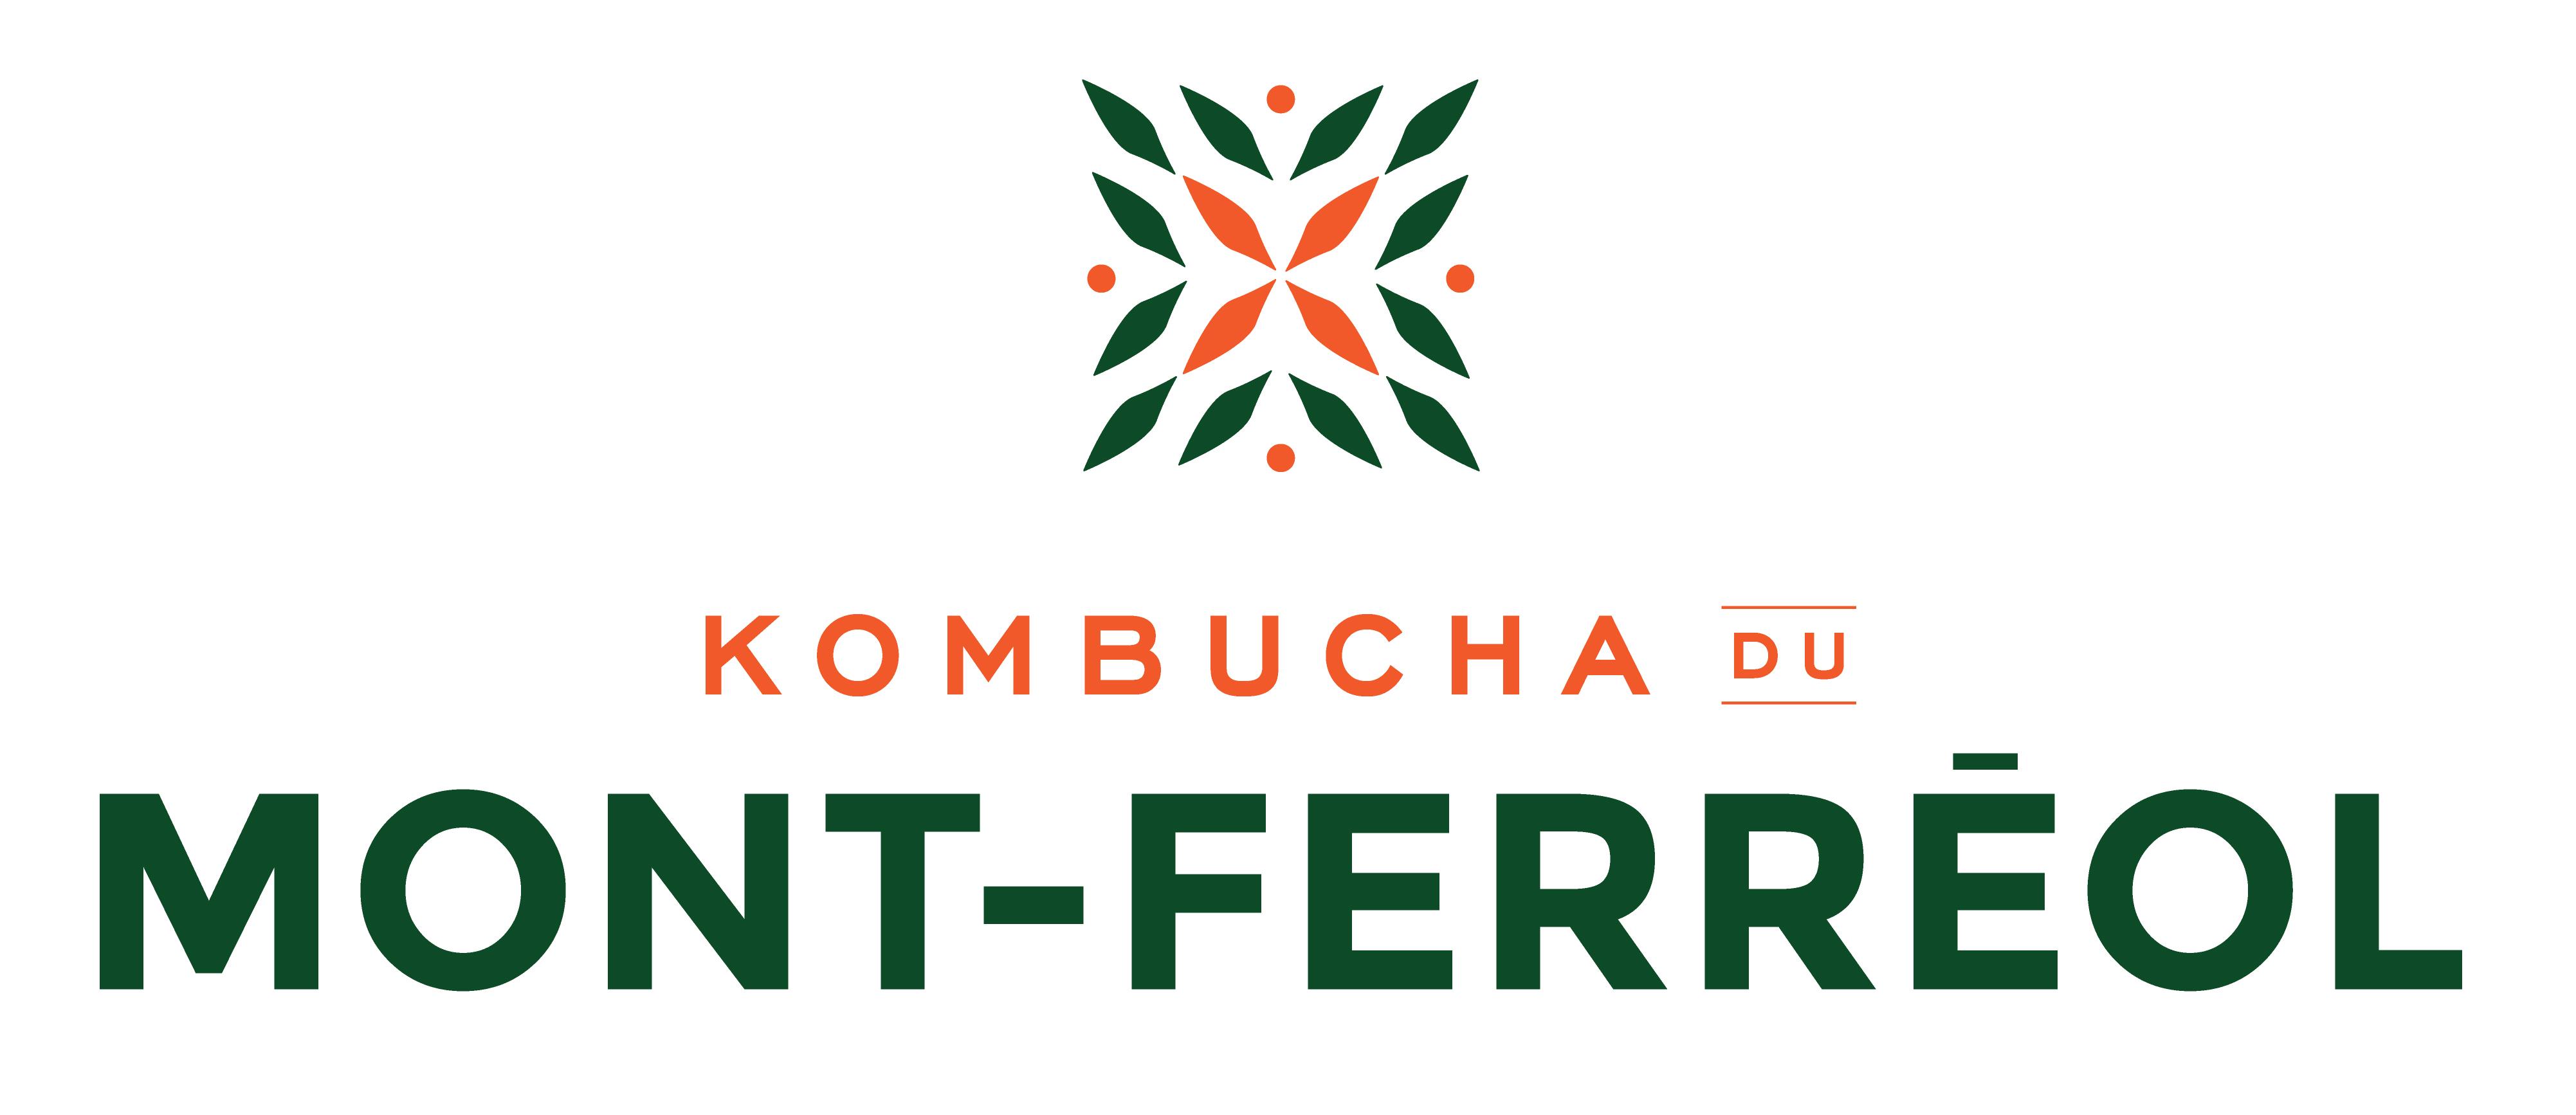 Kombucha du Mont-Ferréol